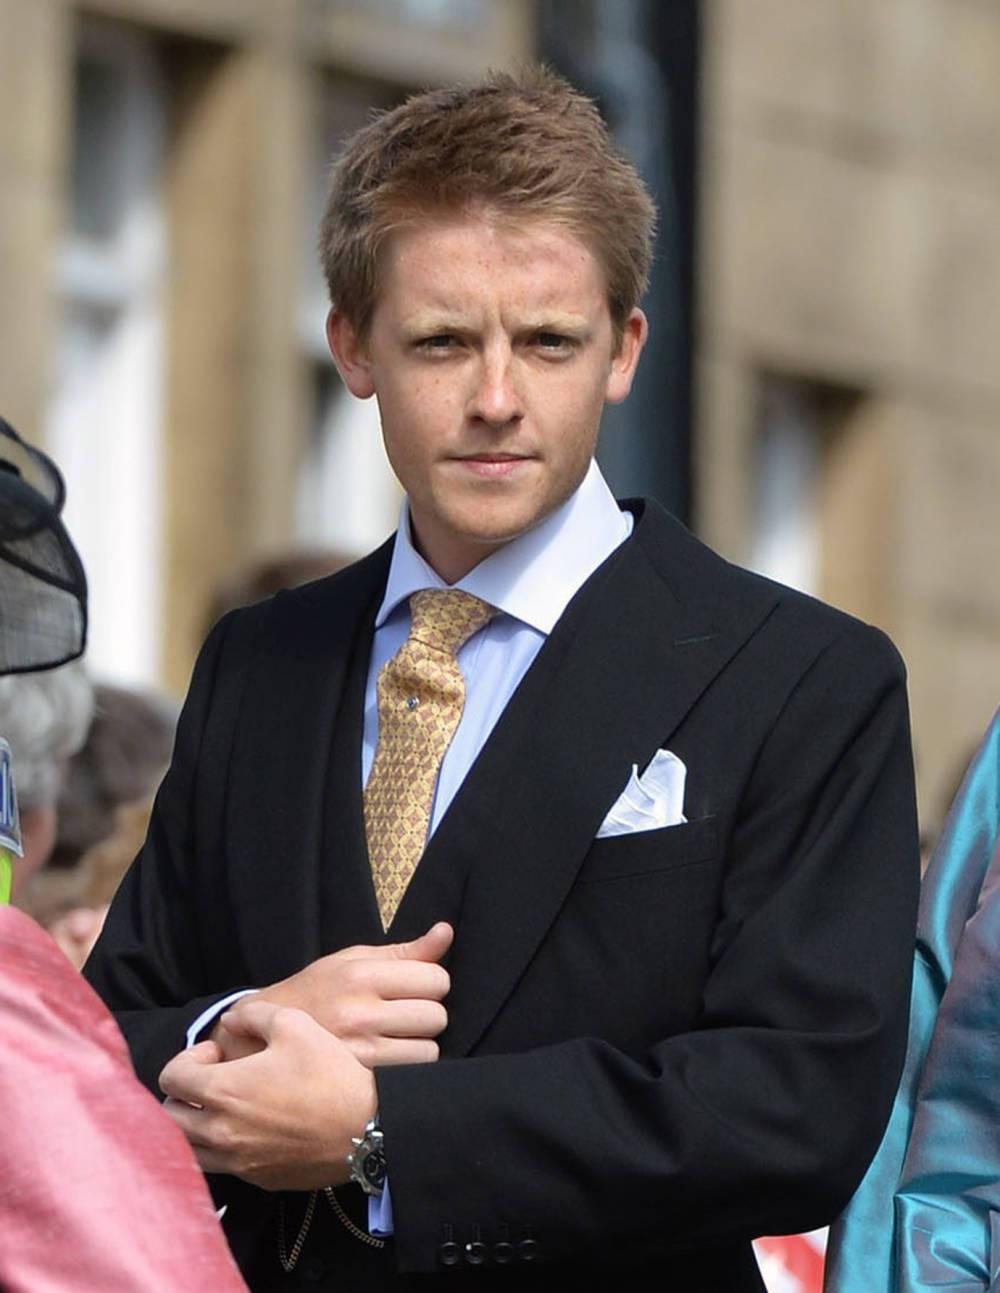 Hugh Grosvenor z Wielkiej Brytanii (fot. ONS)